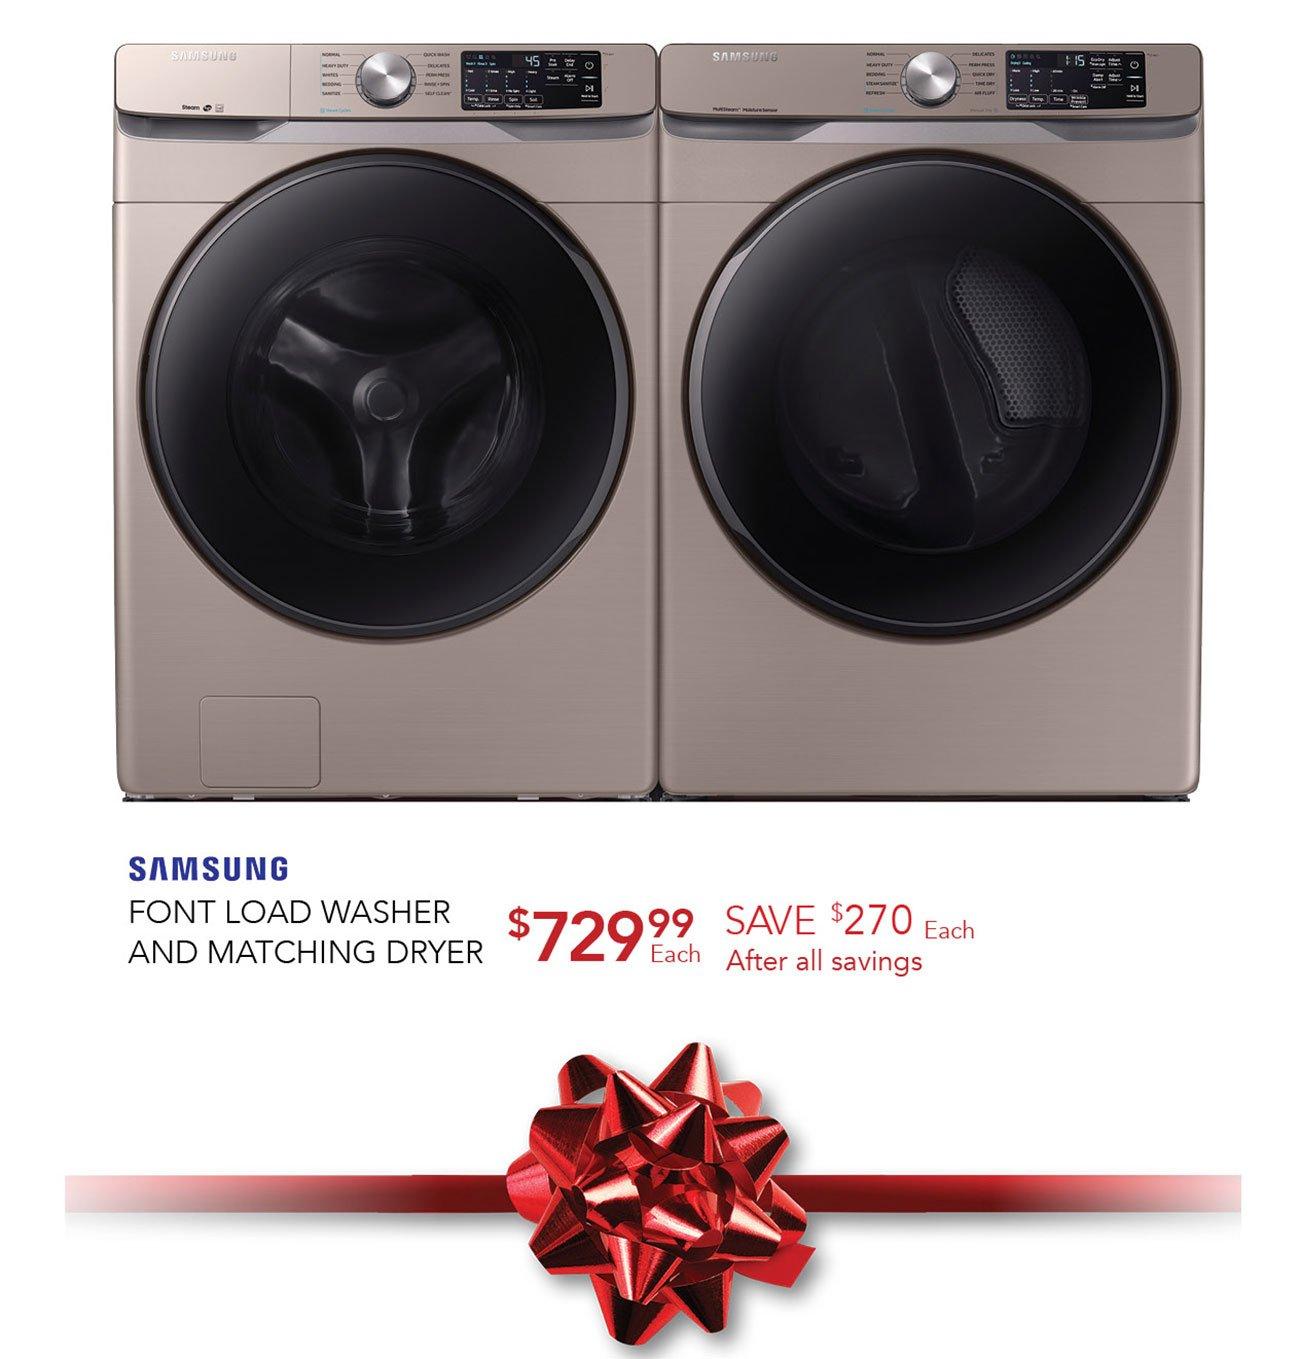 Samsung-front-load-washer-dryer